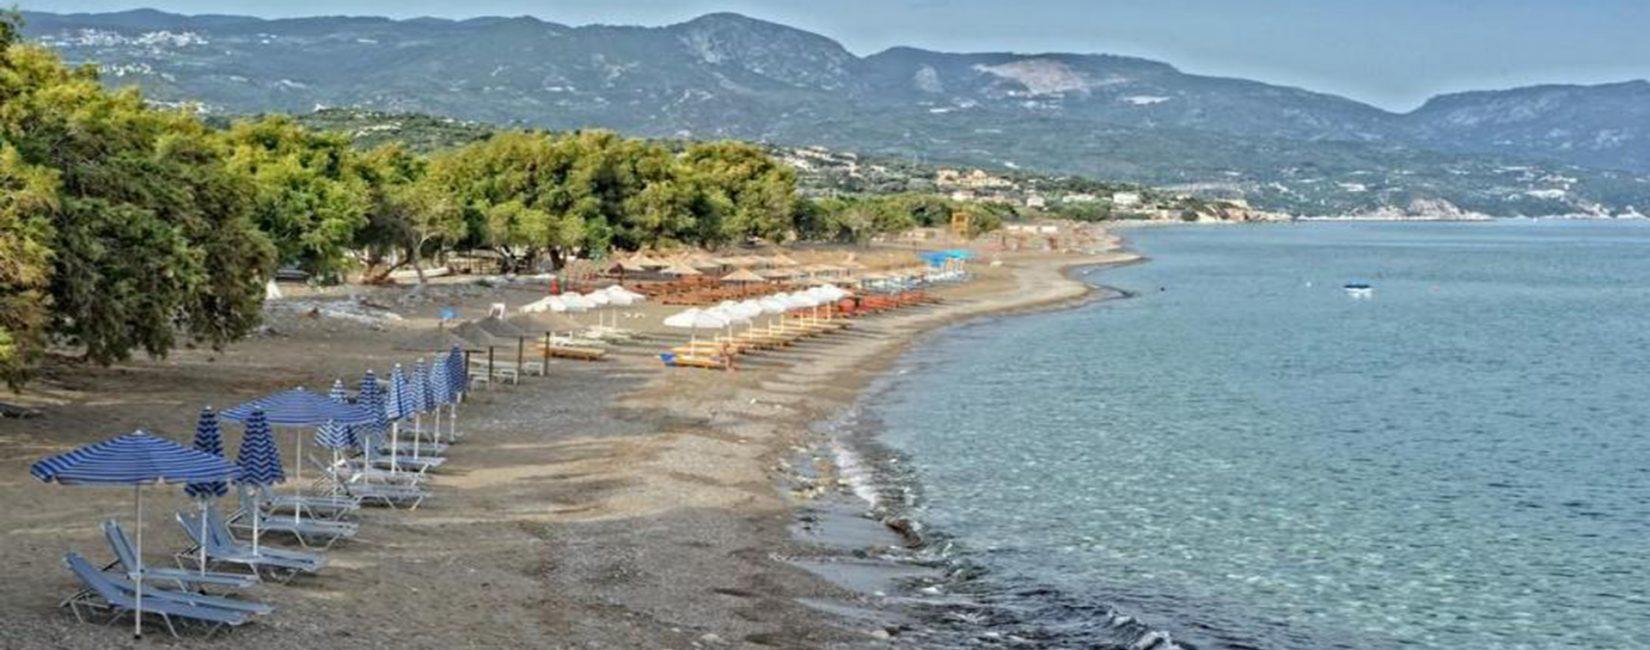 Kristallklare Strand